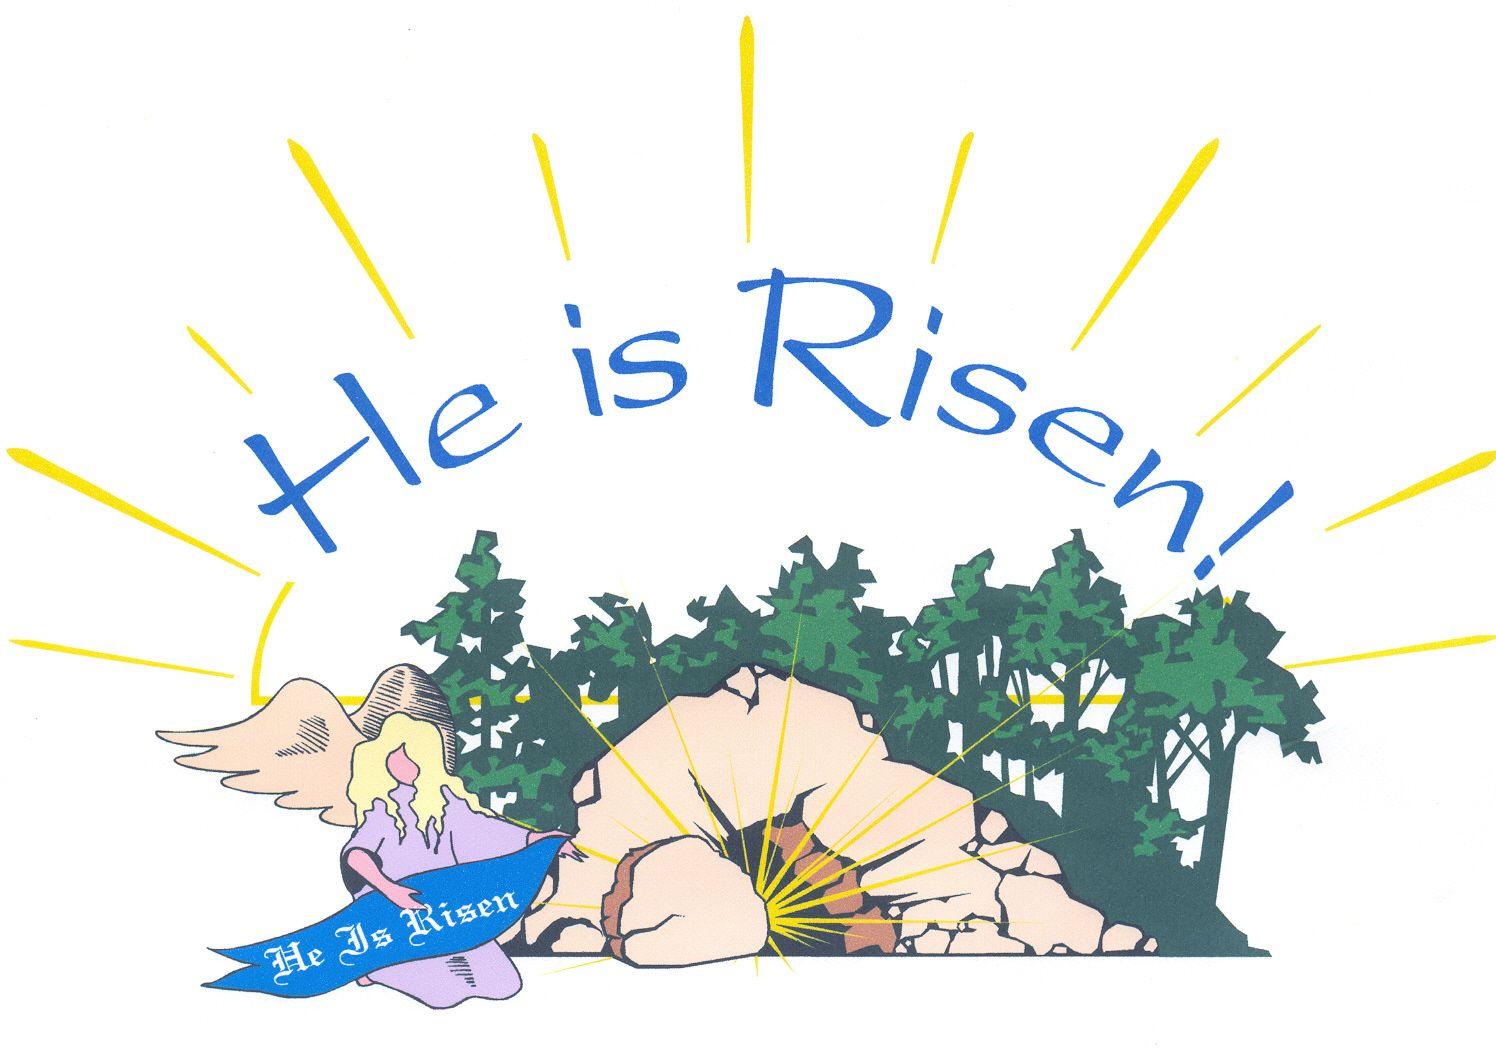 Jesus is Risen.